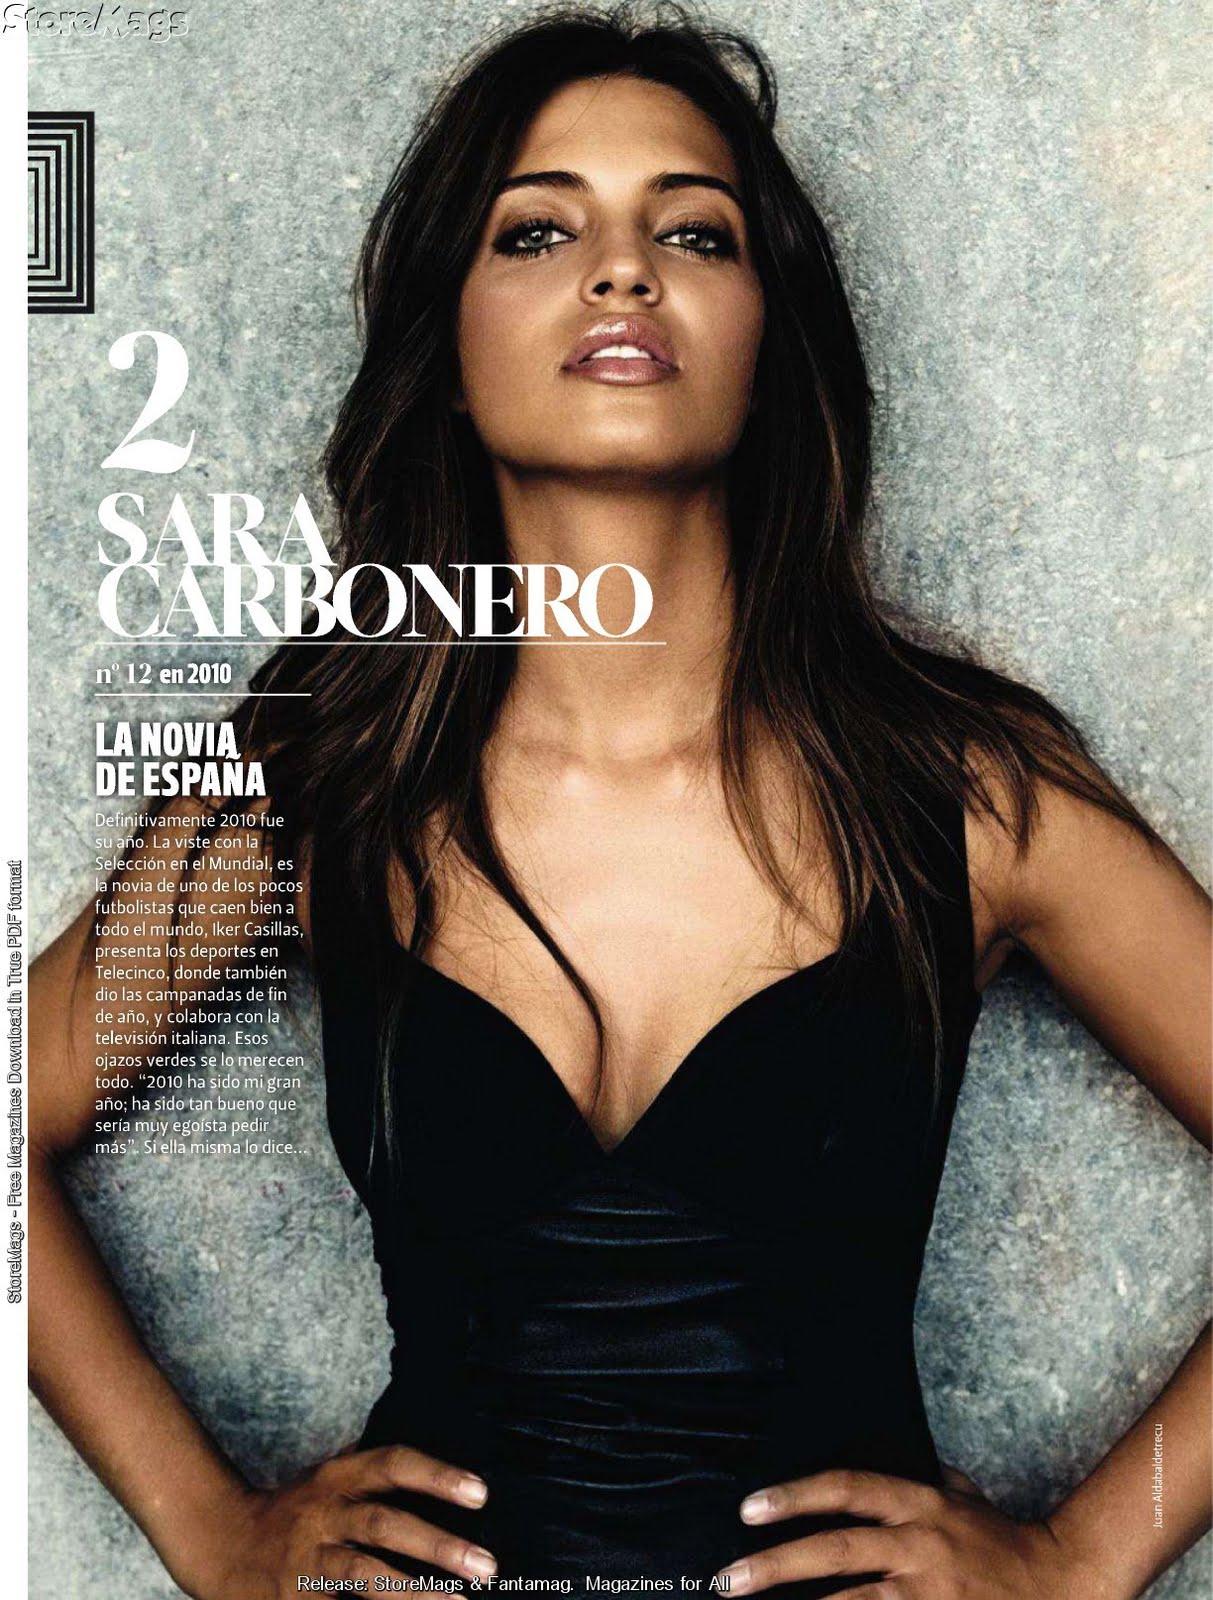 http://2.bp.blogspot.com/-g93-8cldsTk/TdznysdfMpI/AAAAAAAAARE/womPDwEM7Ug/s1600/2+Sara+Carbonero.jpg